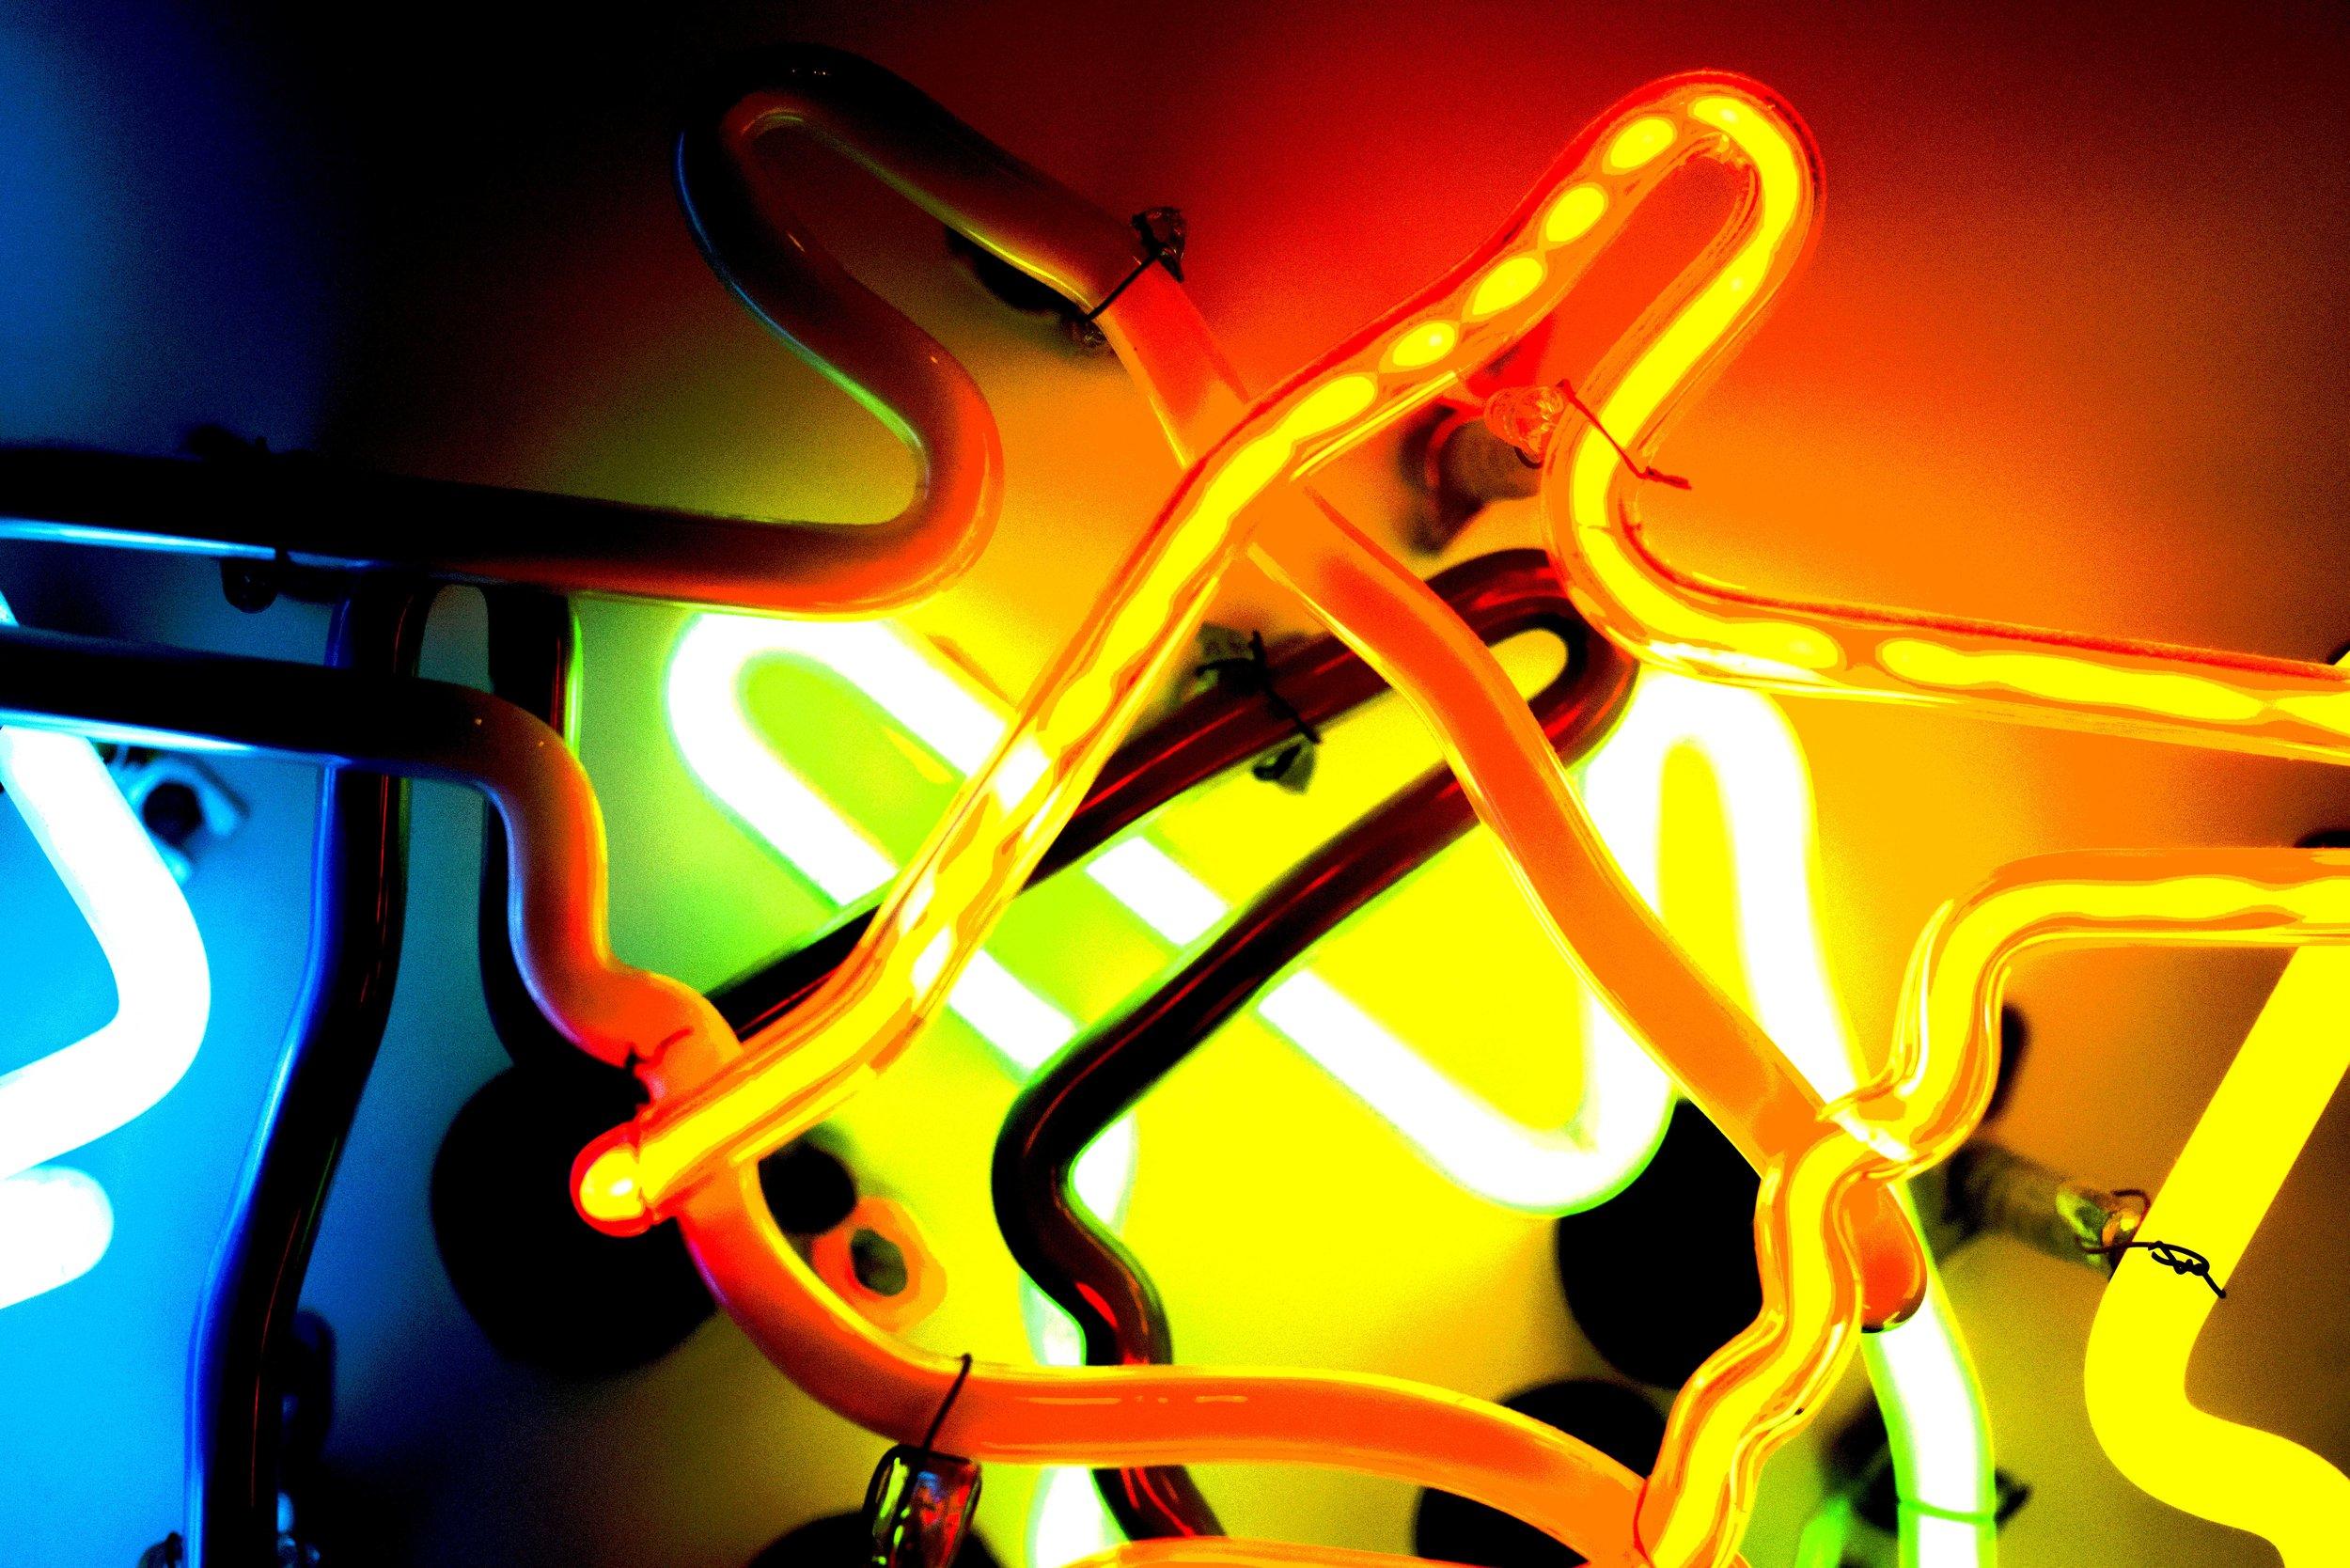 Neoncrazy.jpg